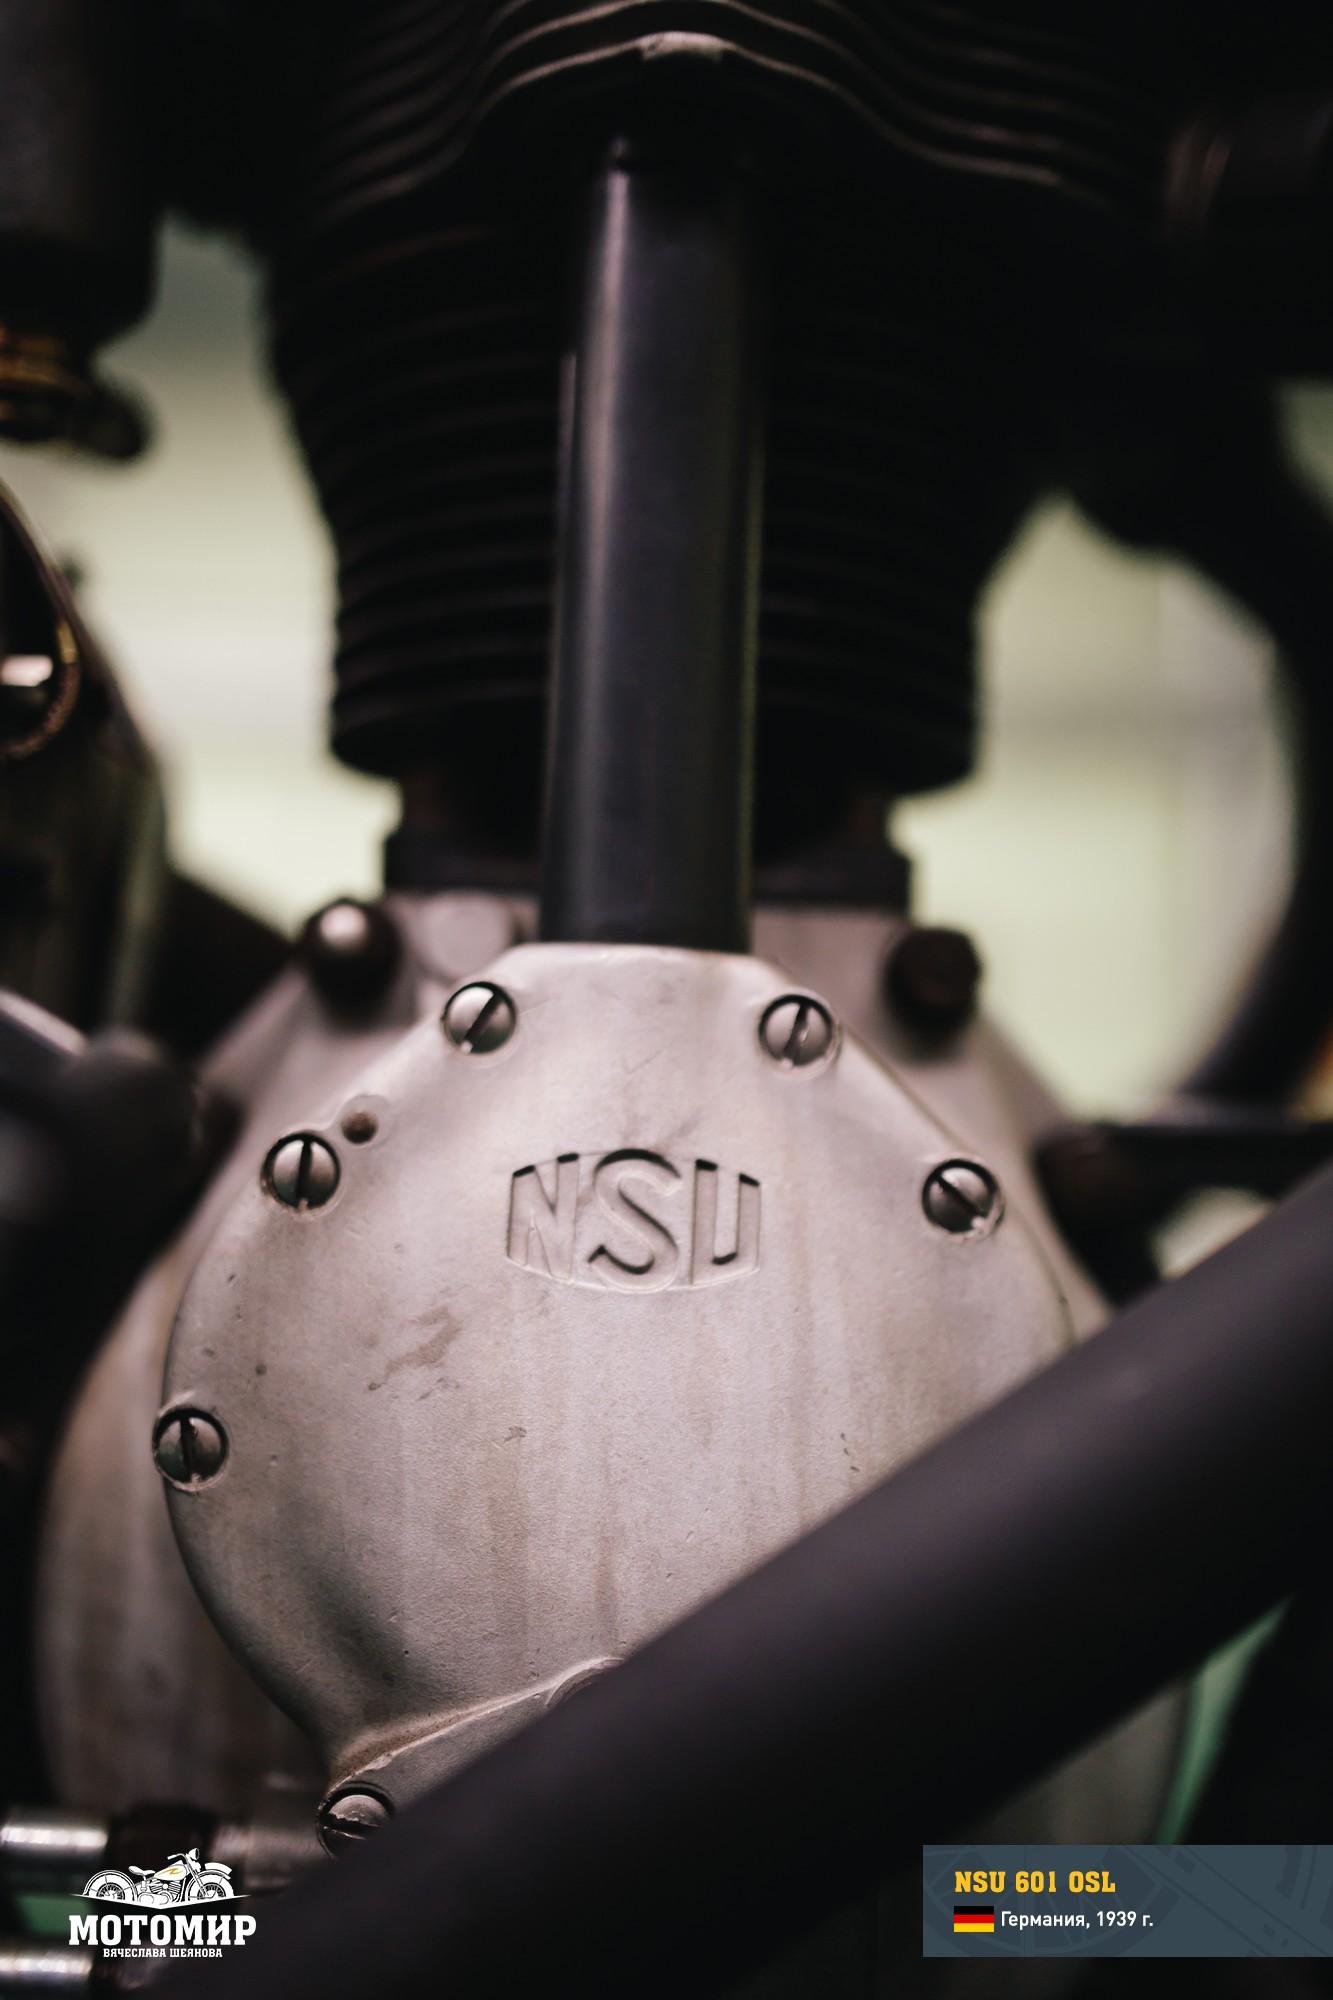 nsu-601-osl-201512-web-28